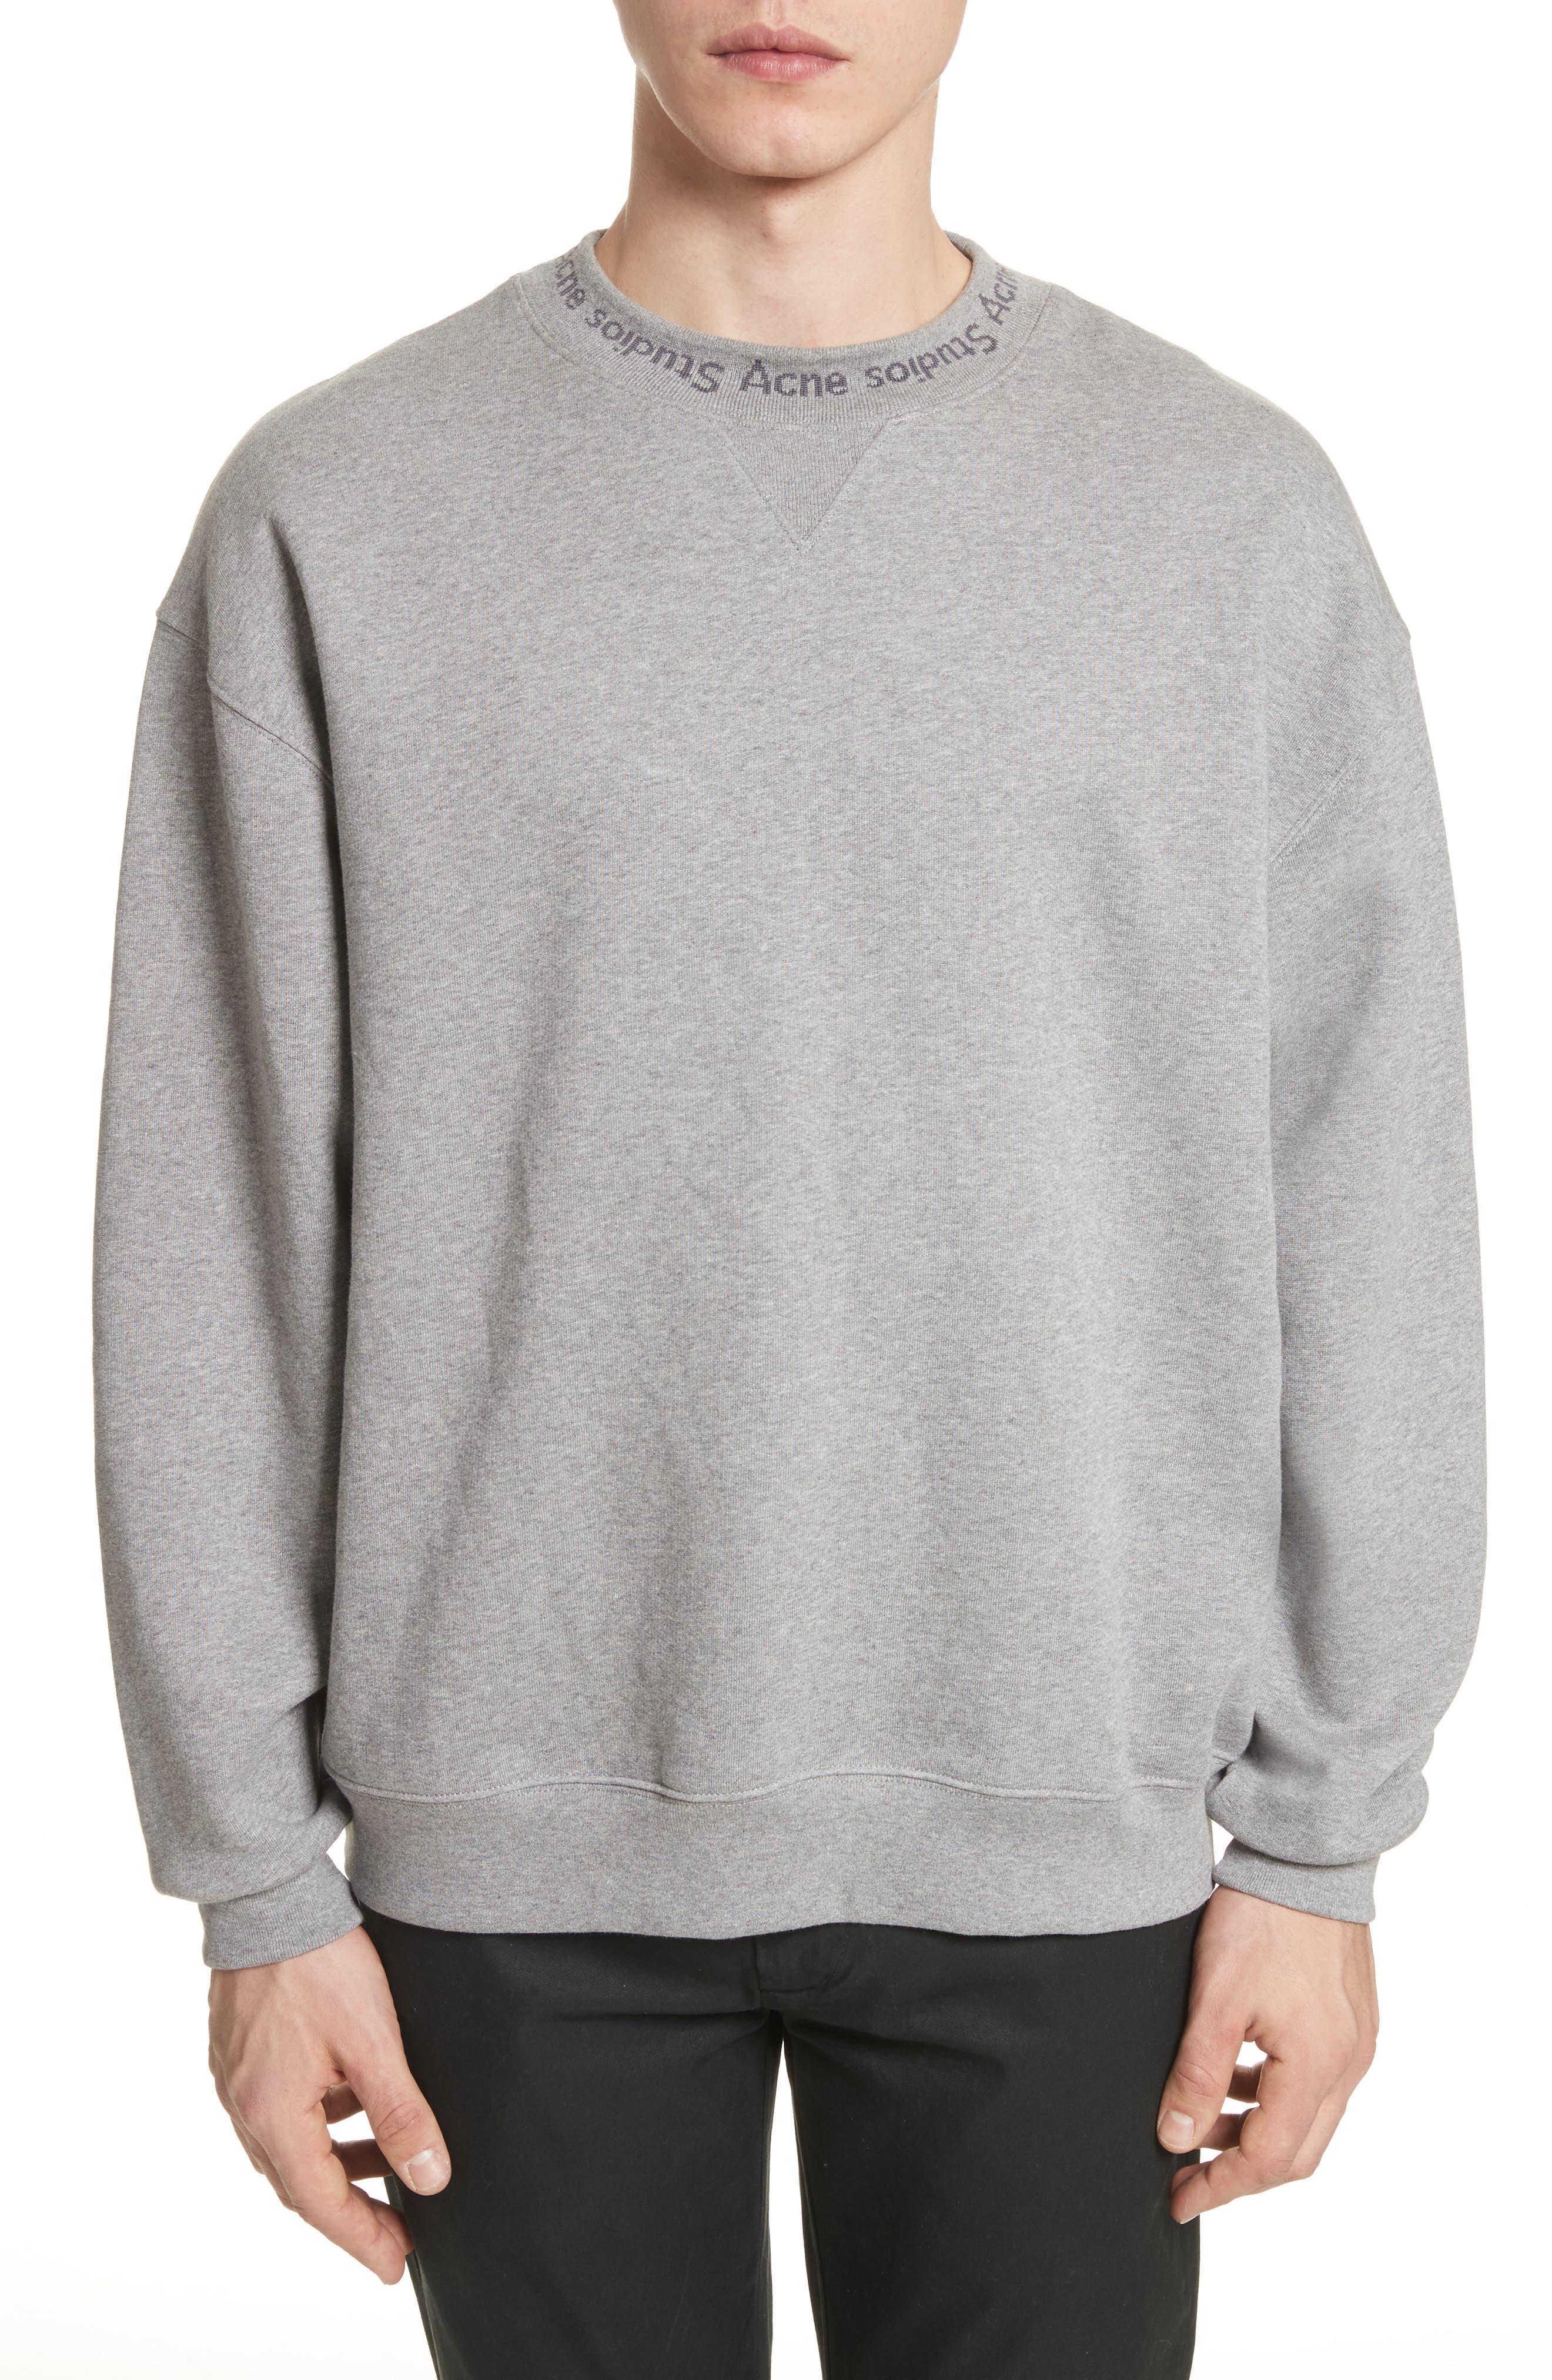 Alternate Image 1 Selected - Acne Studios Flogo Oversize Cotton Sweatshirt